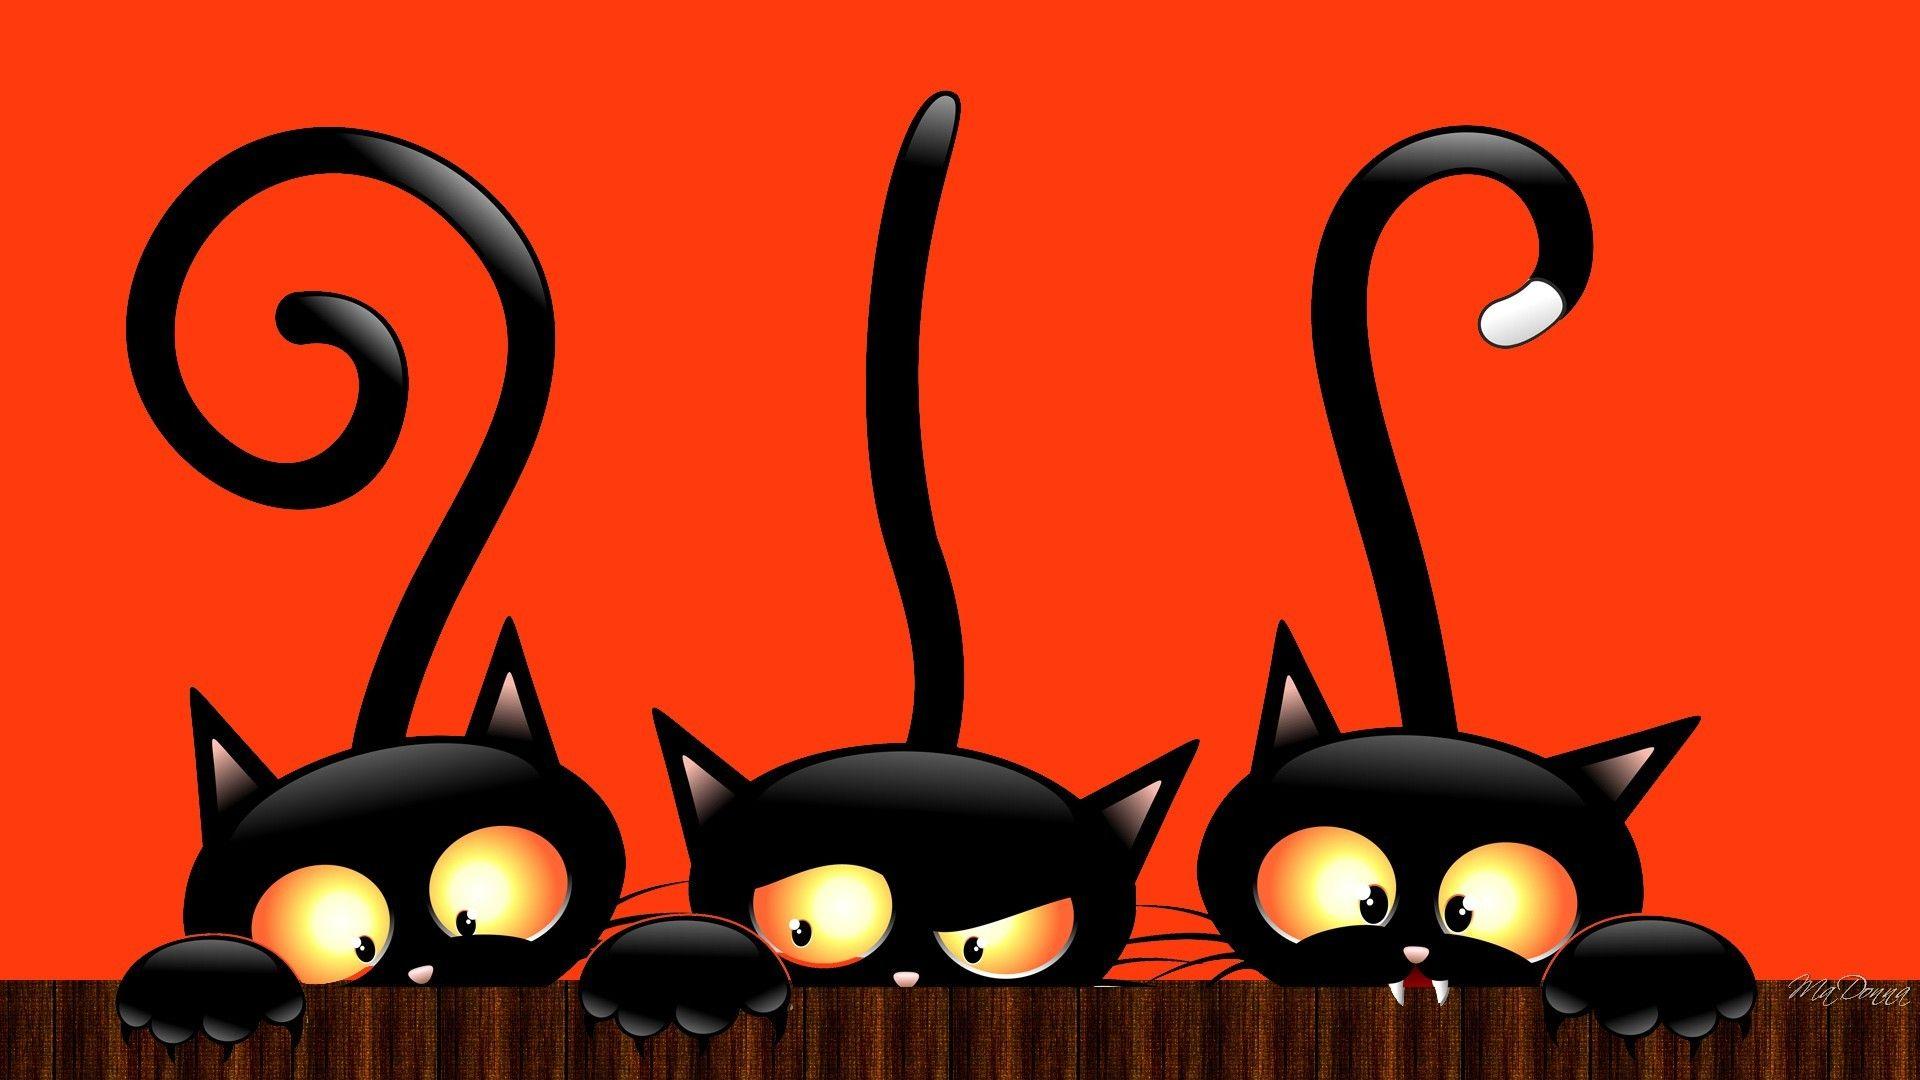 Download Snoopy Halloween Wallpaper Full Hd For Desktop Wallpaper 1920x1080